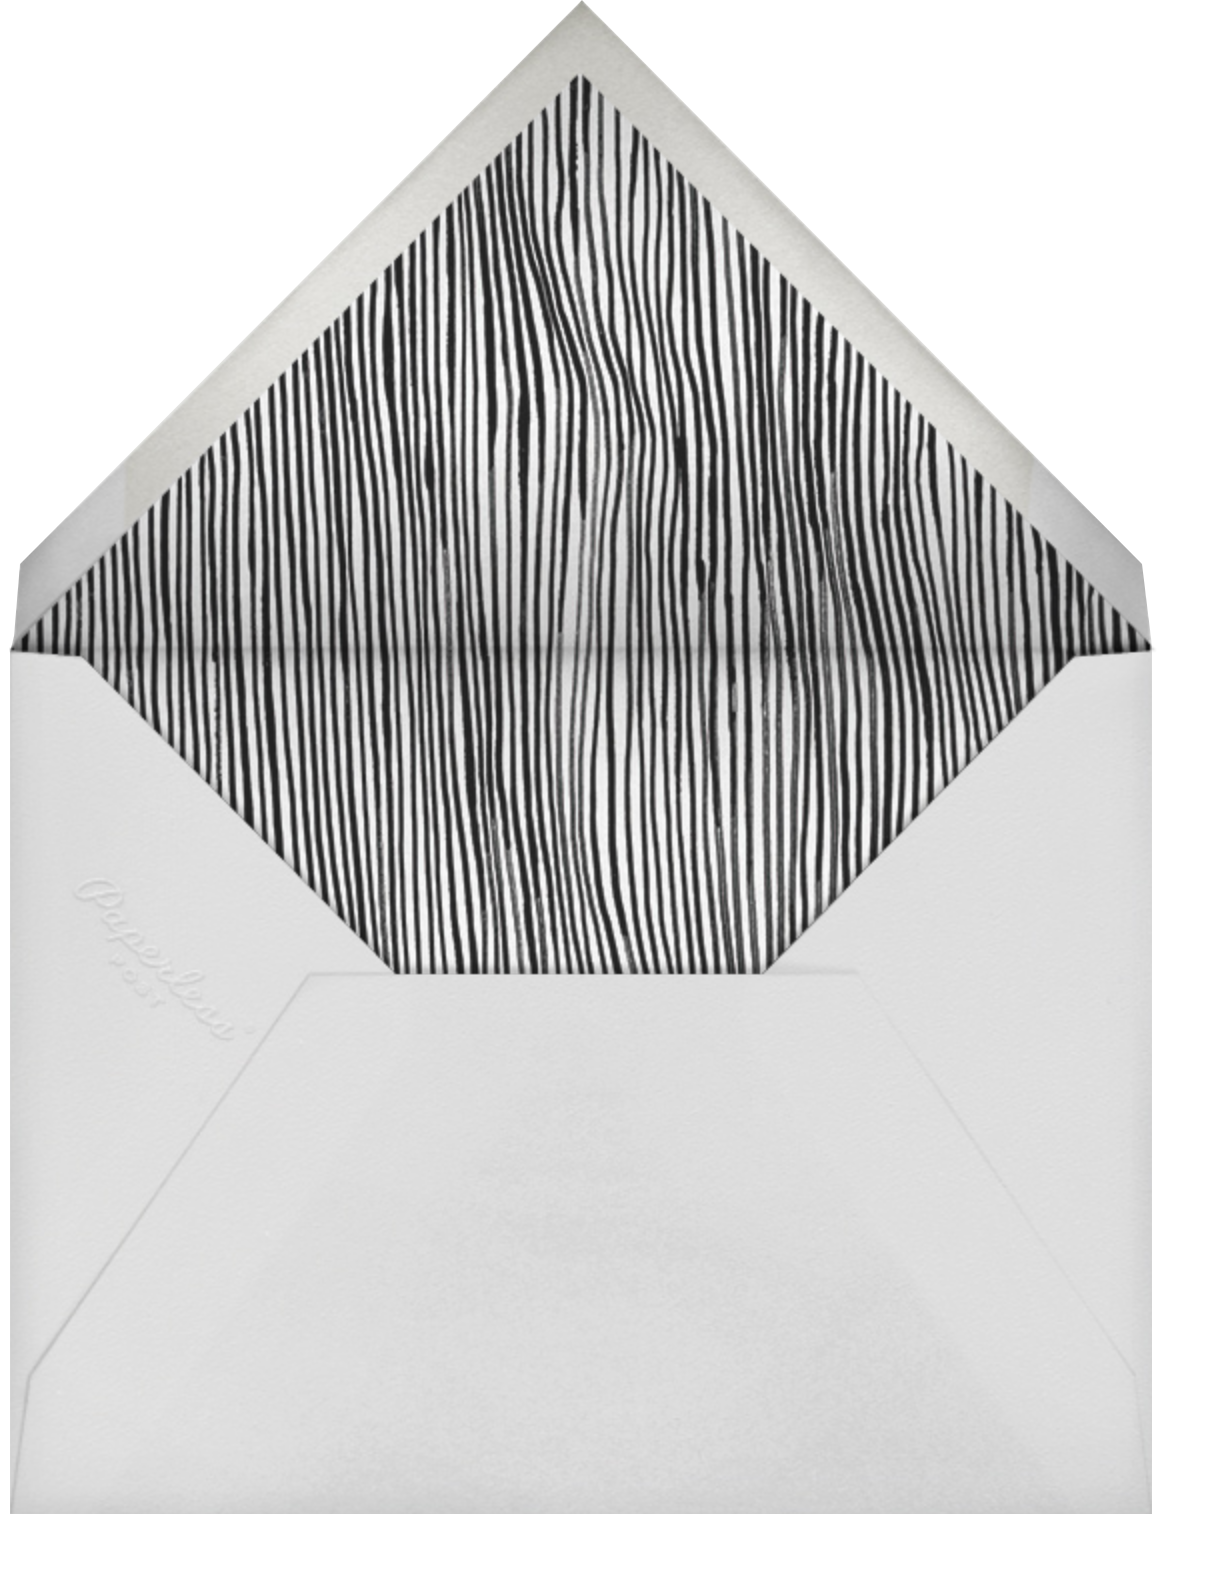 Appose - Kelly Wearstler - Save the date - envelope back